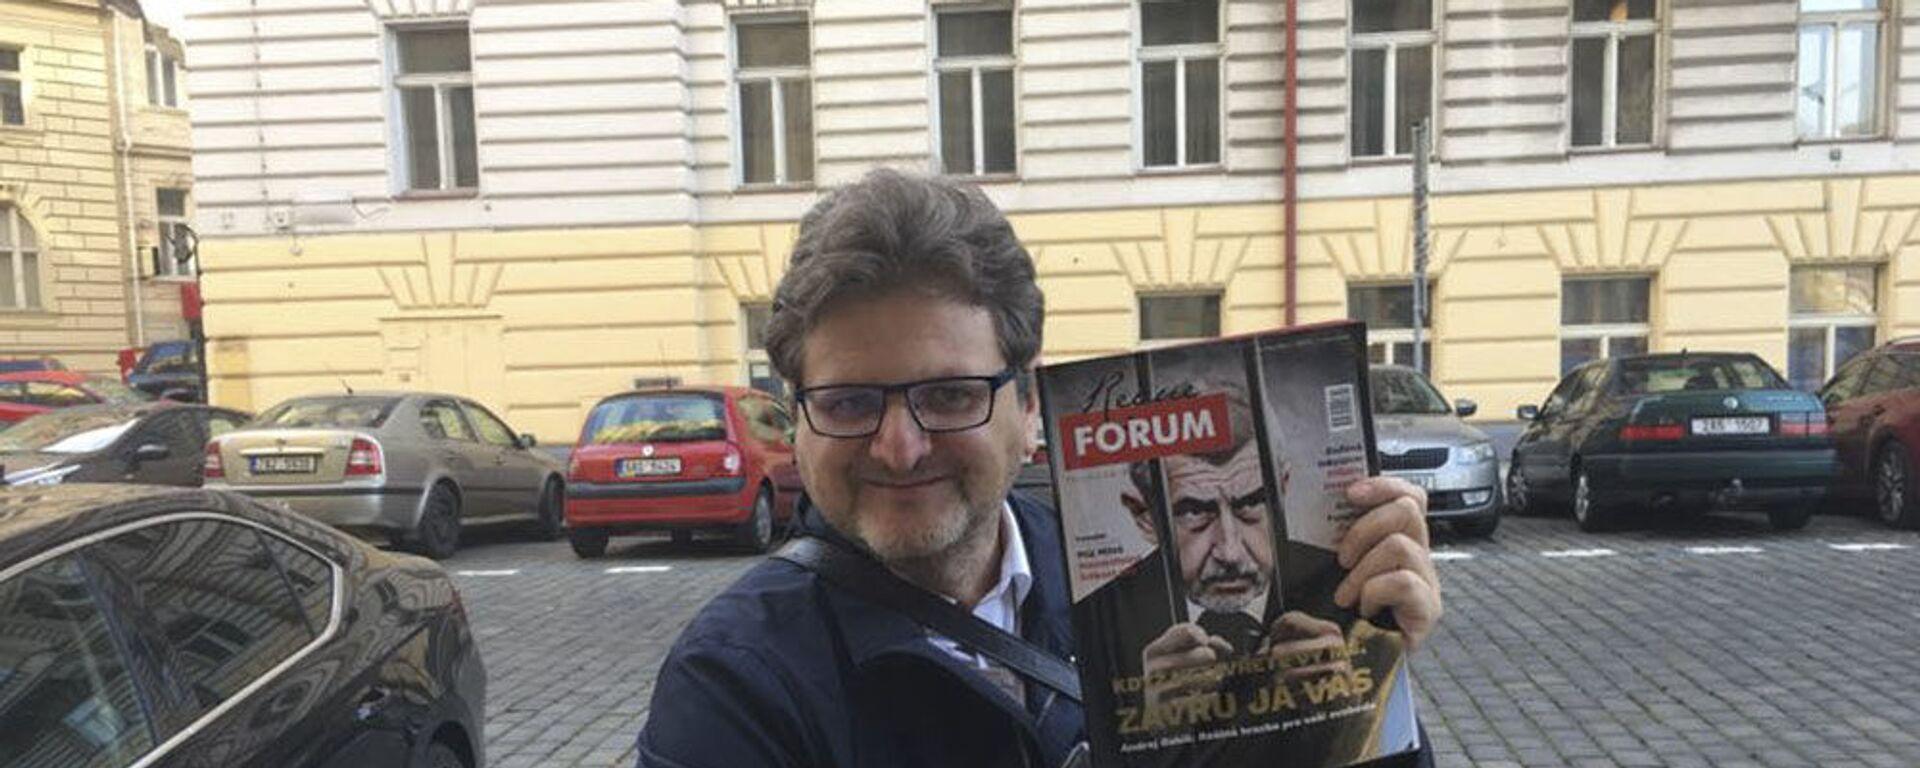 Šéfredaktor portálu Forum24 Pavel Šafr - Sputnik Česká republika, 1920, 03.09.2021